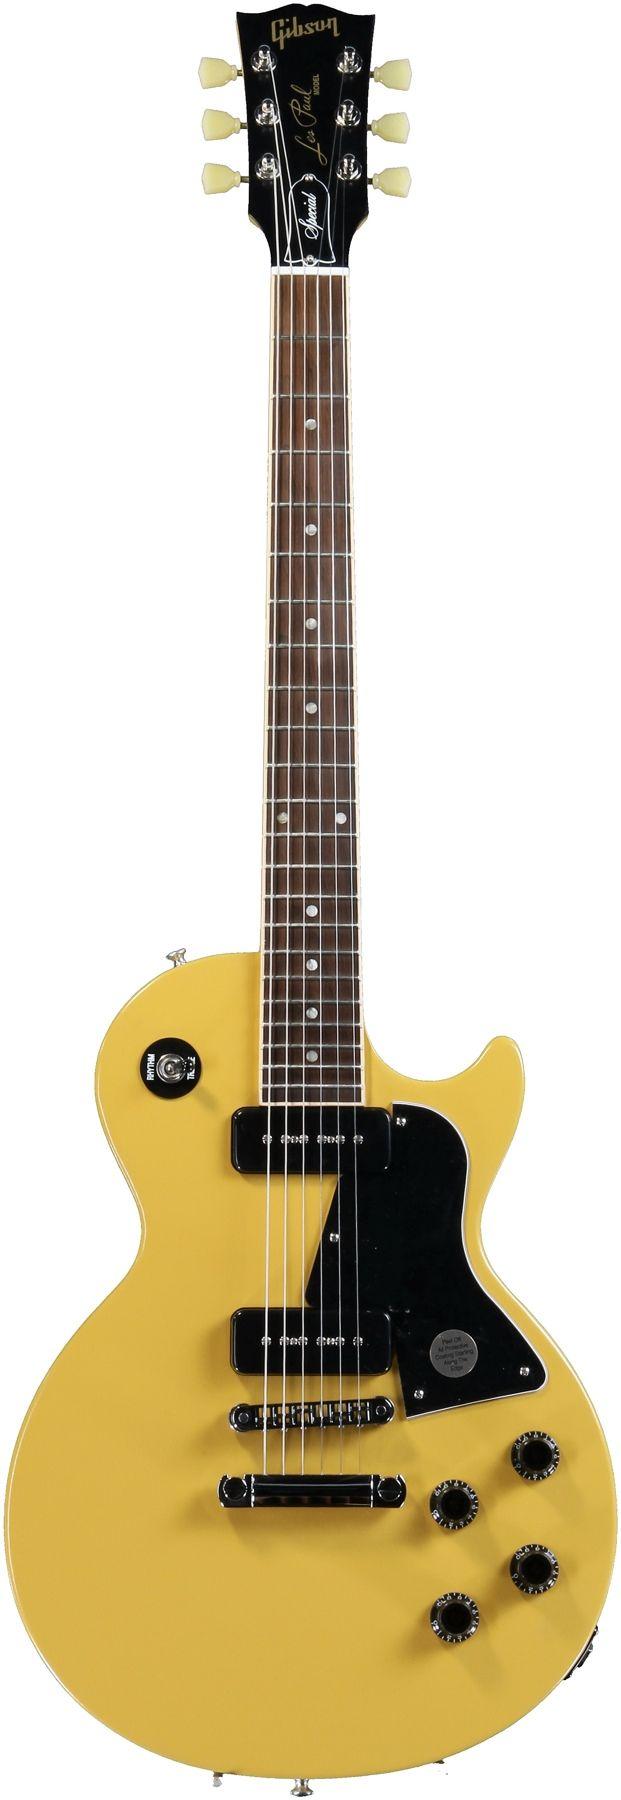 Gibson Les Paul Junior Special P-90 (Satin Yellow)